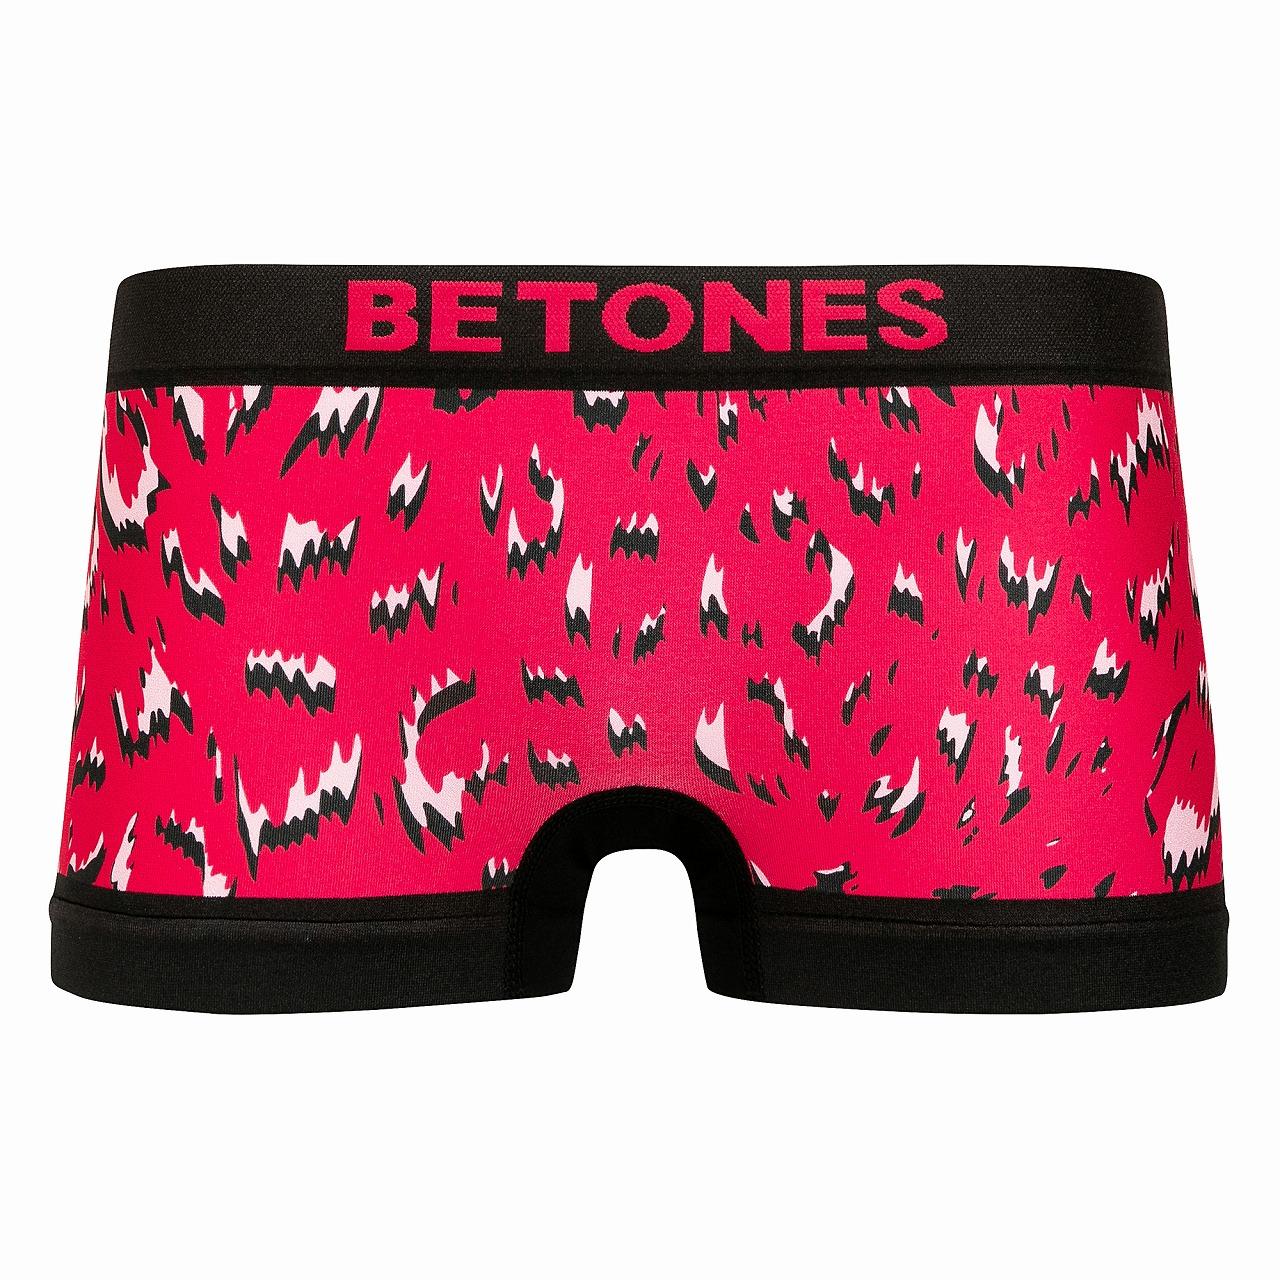 BETONES(ビトーンズ)/LEOPARD3(PINK)-Lady's